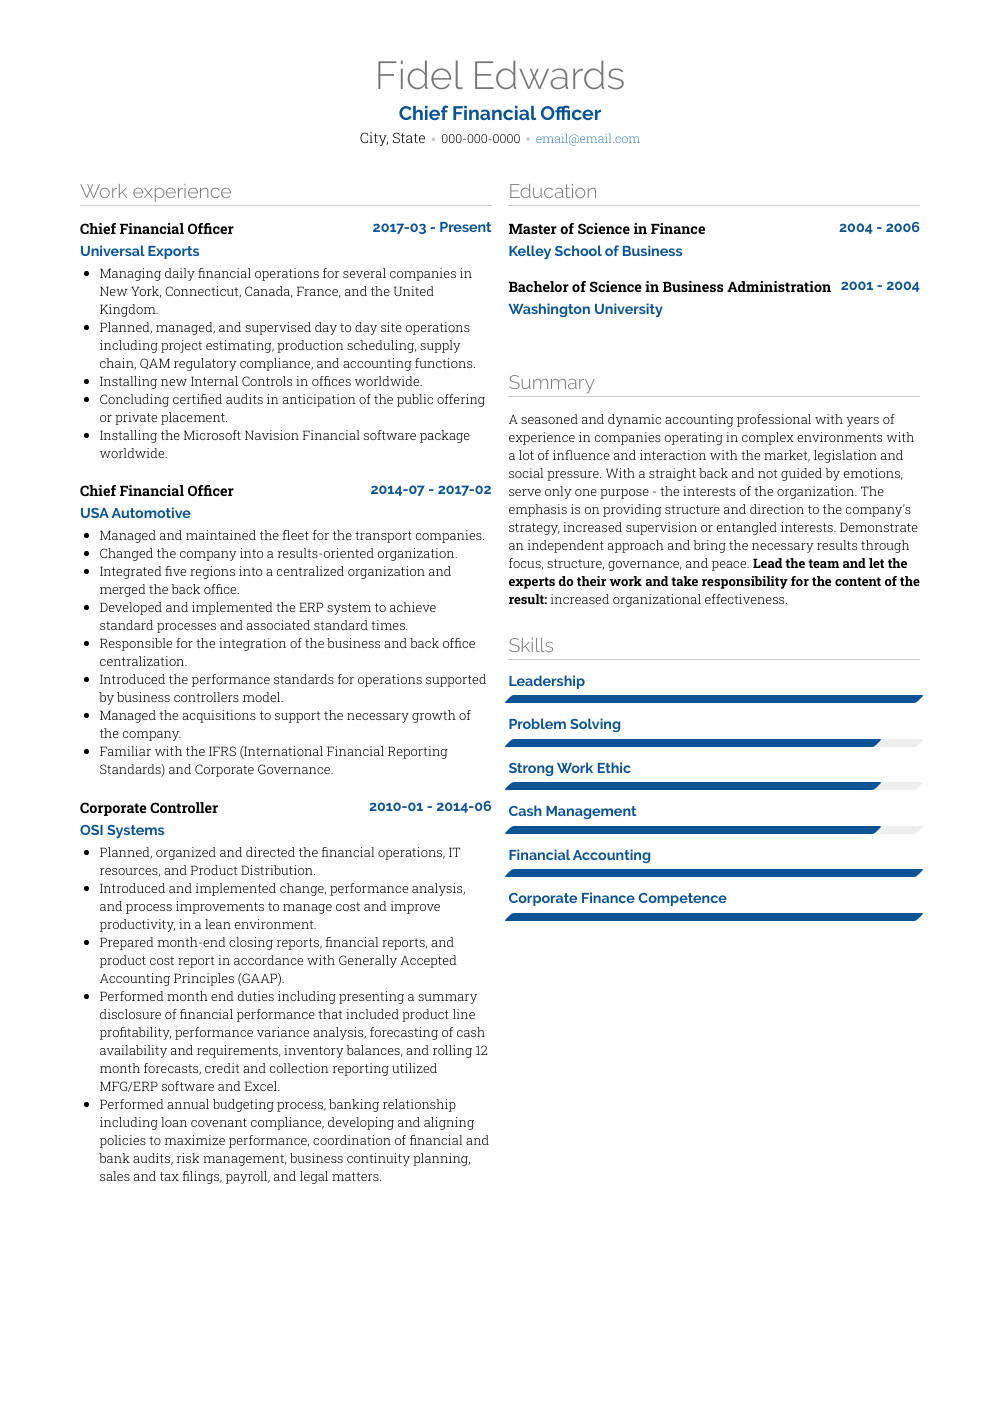 examples of job accomplishments